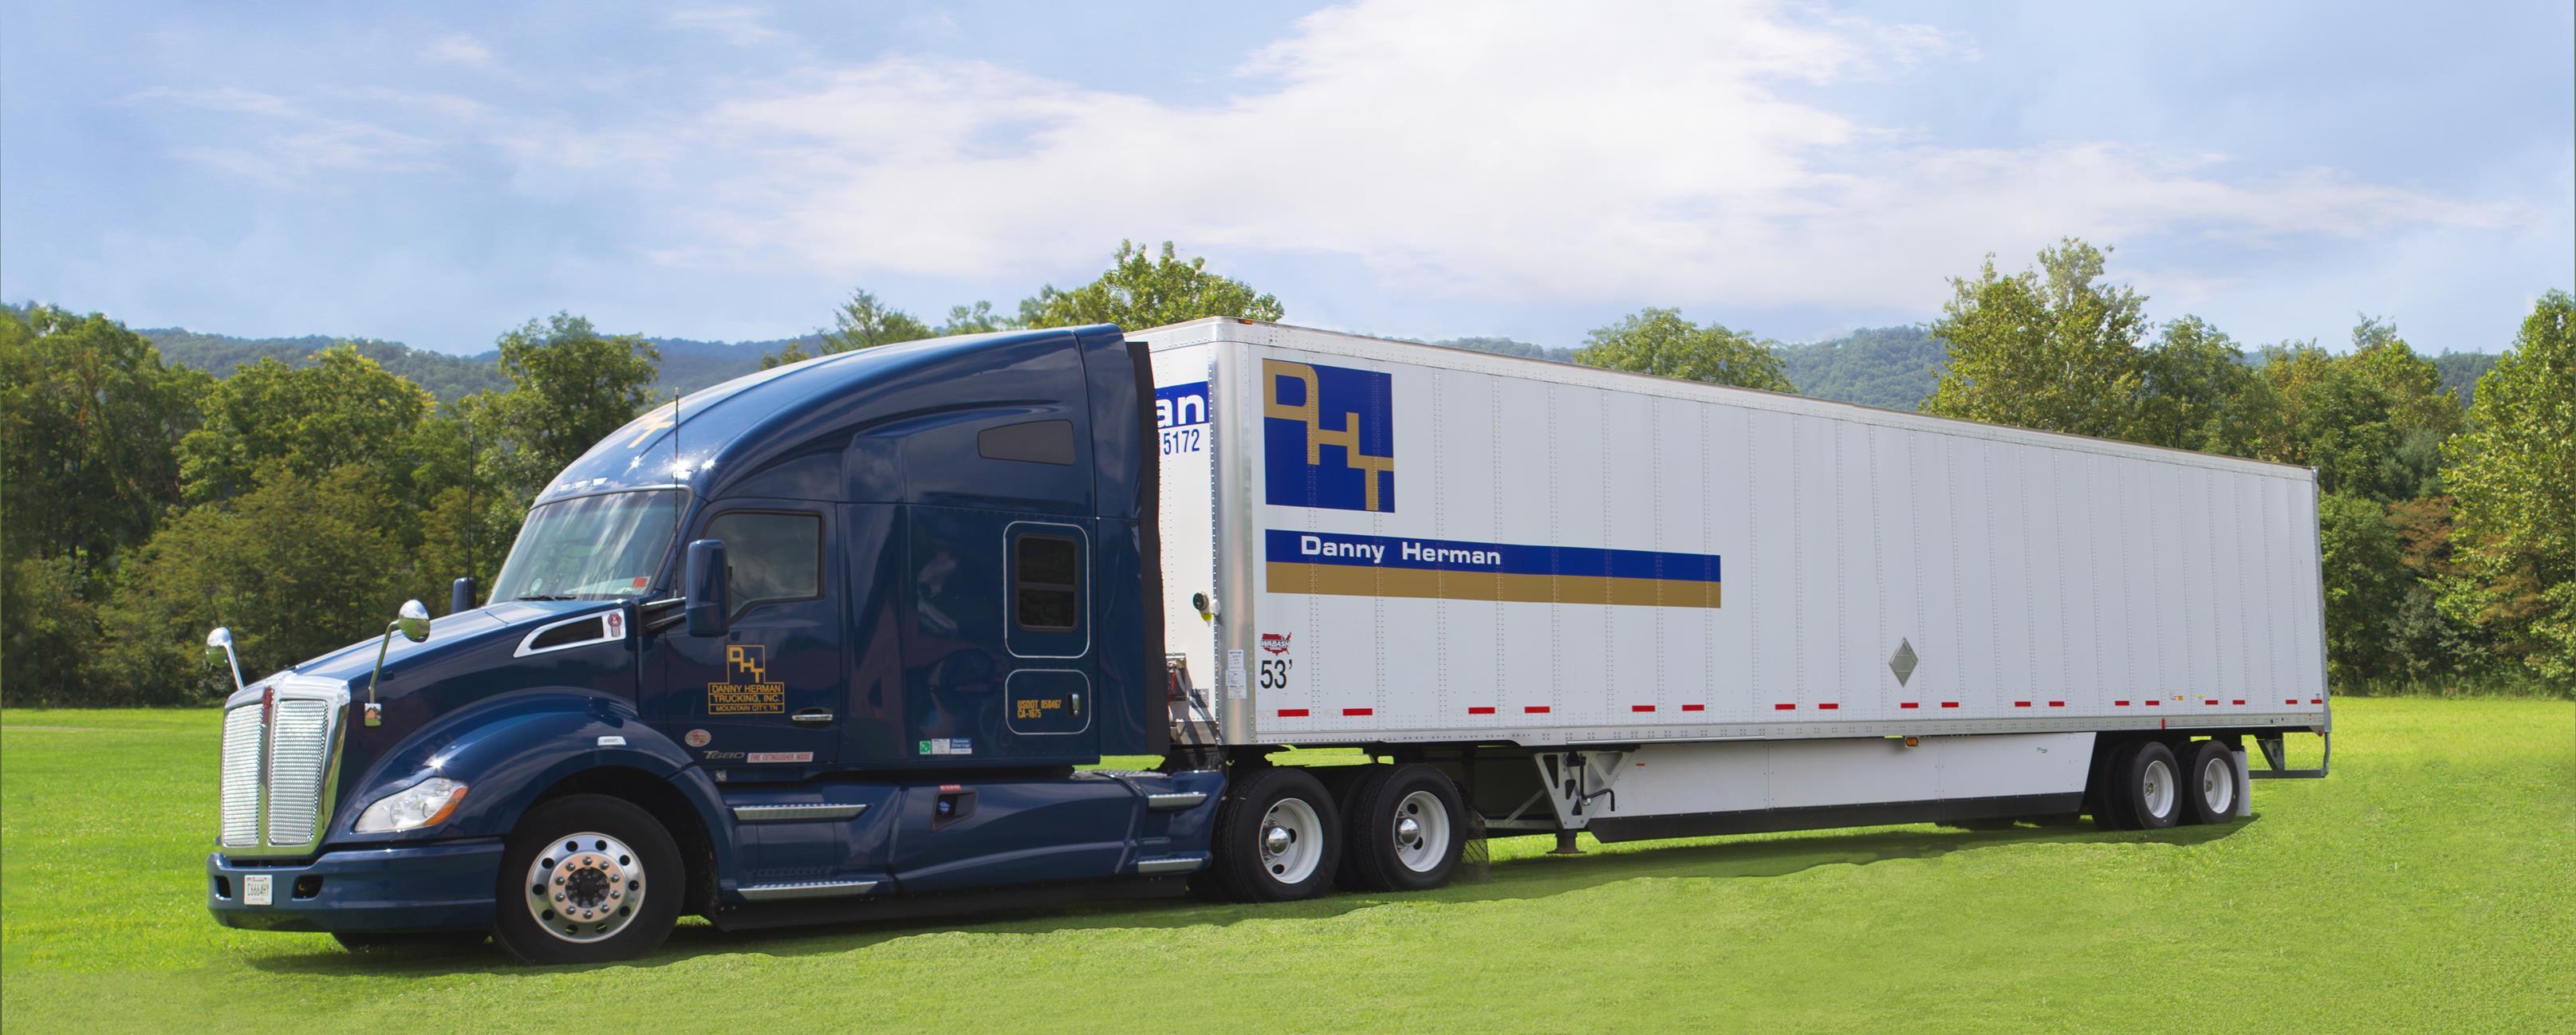 Danny Herman Trucking